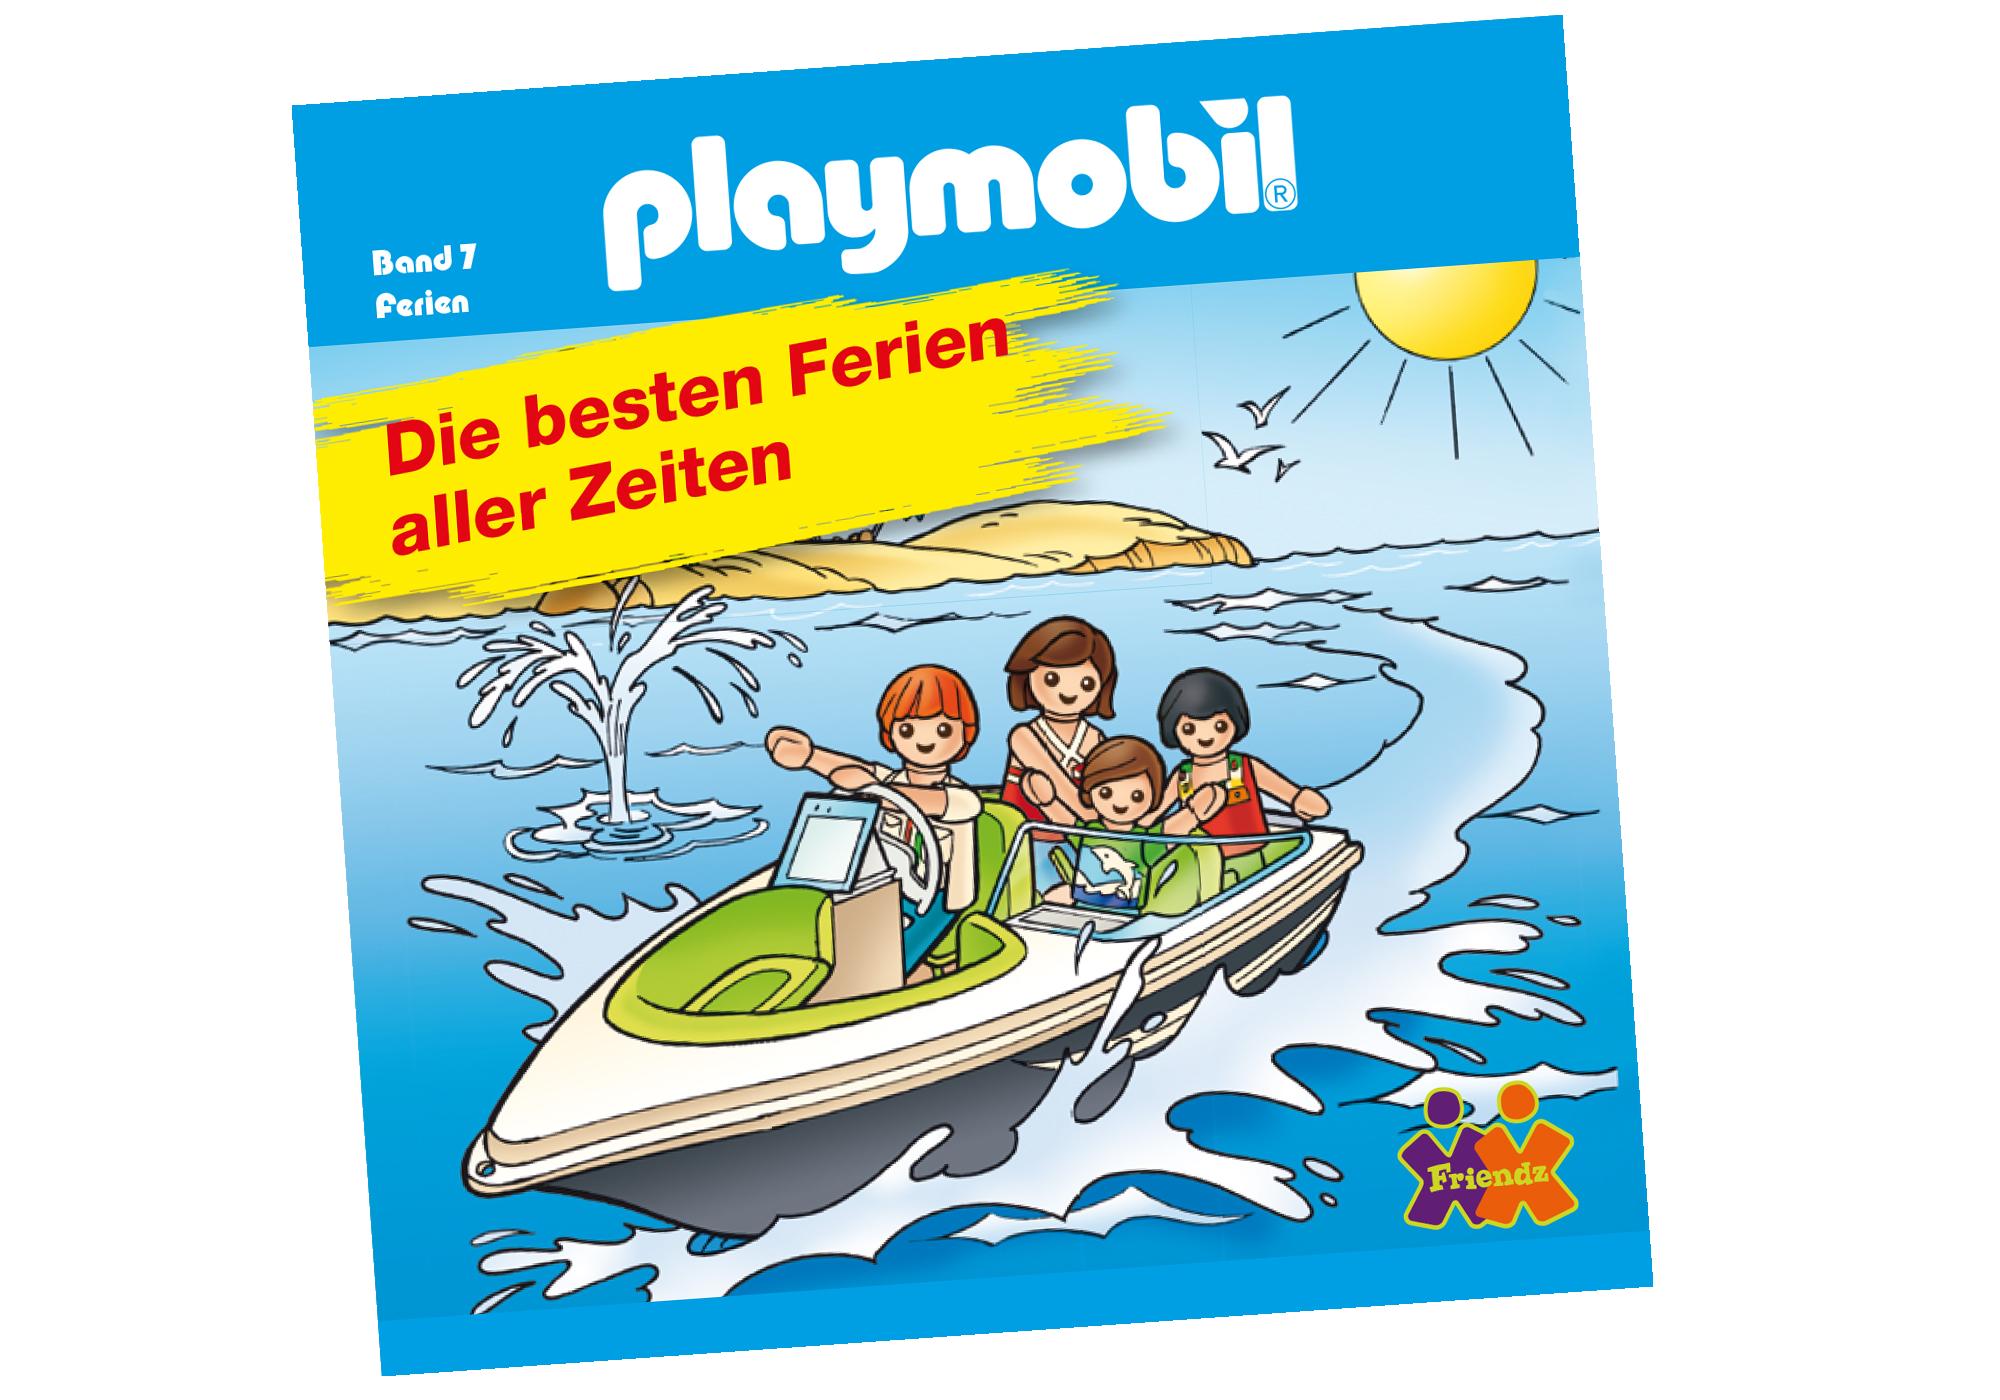 http://media.playmobil.com/i/playmobil/80428_product_detail